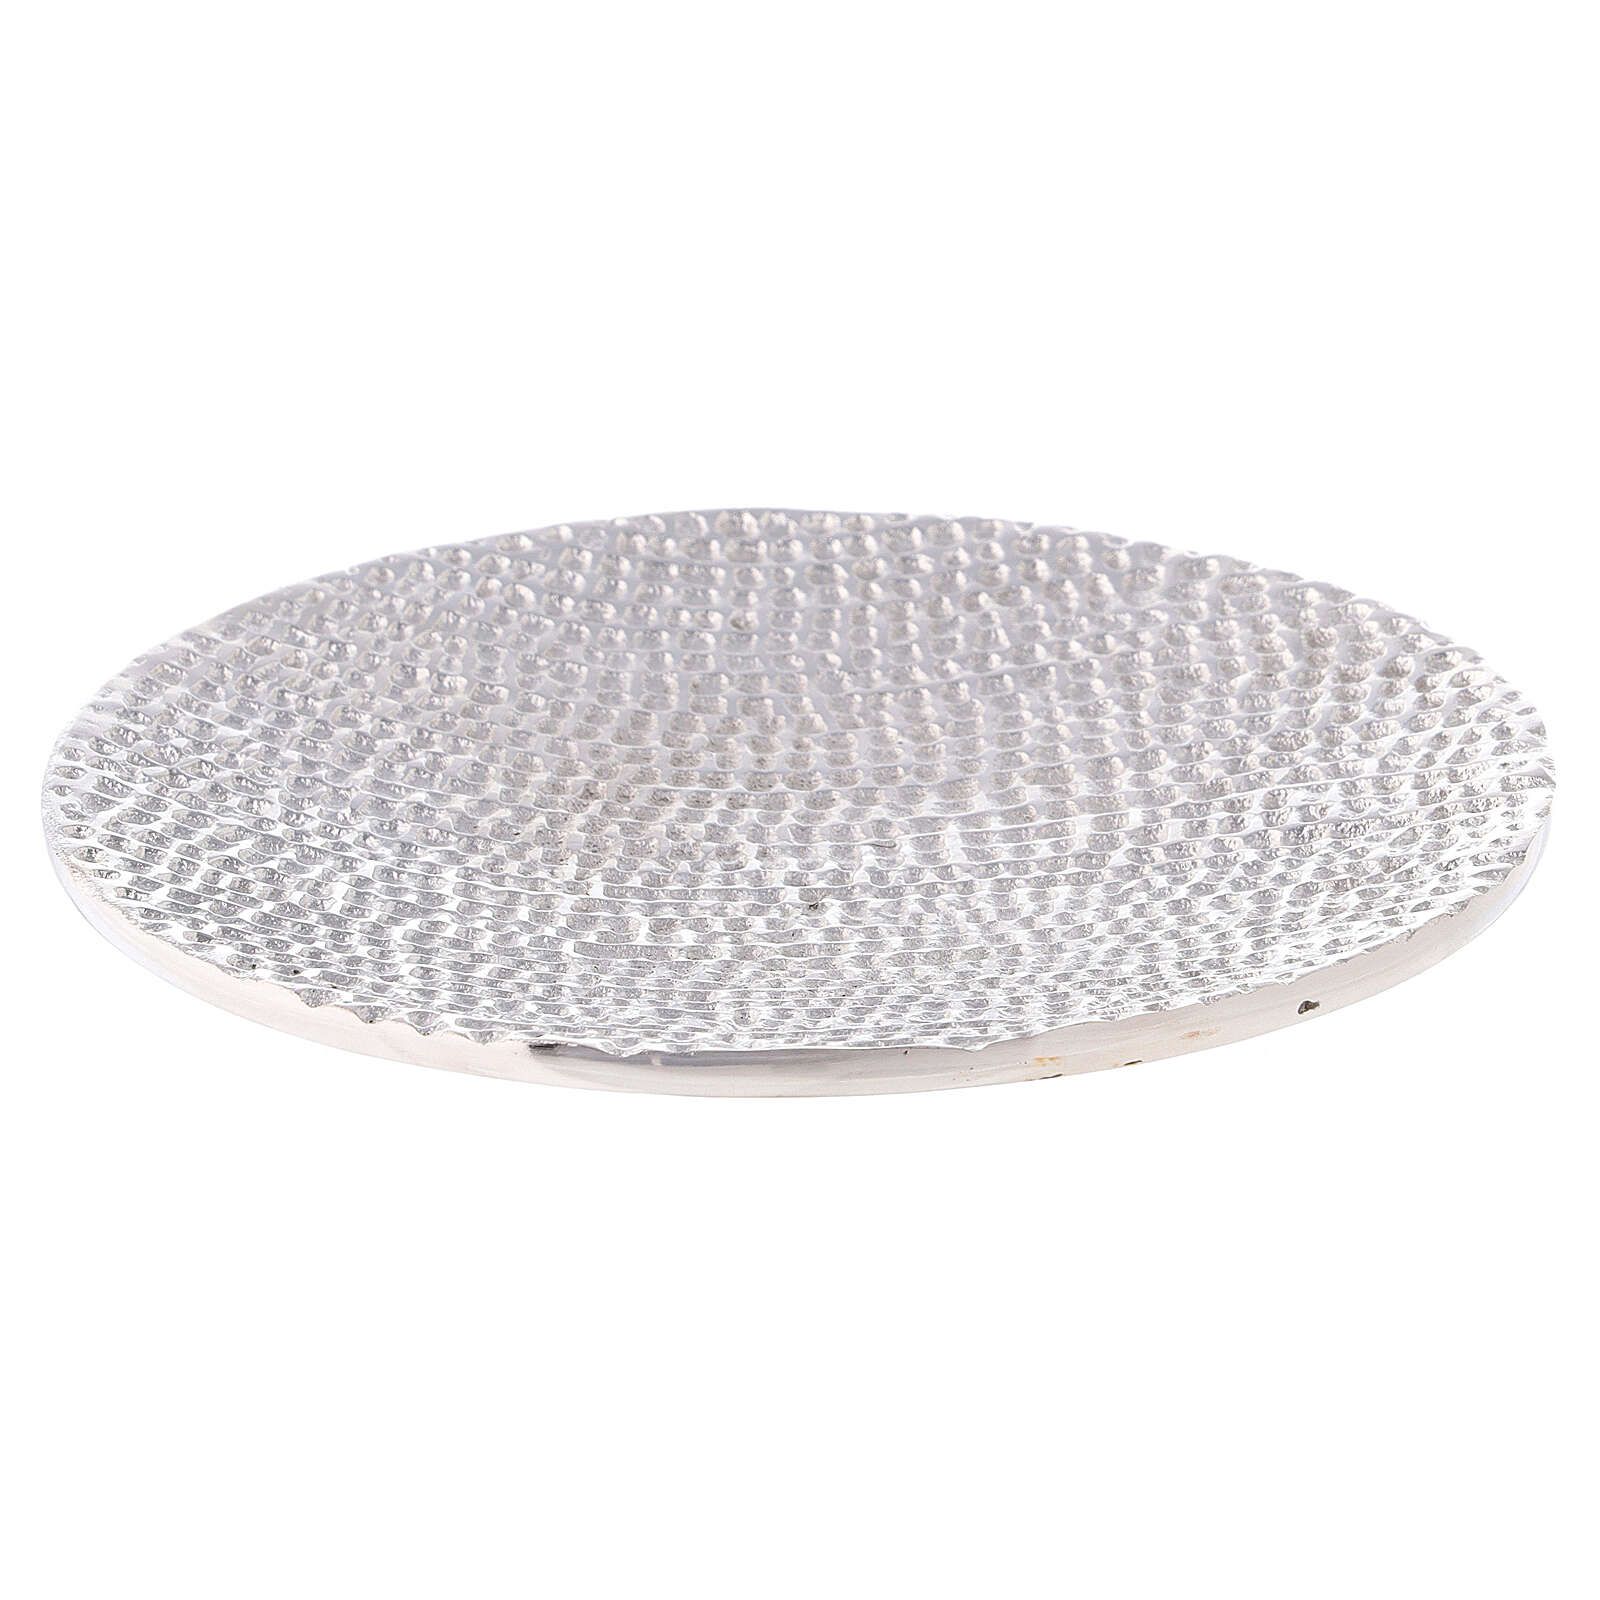 Plato portavela nido abeja aluminio diámetro 14 cm 3